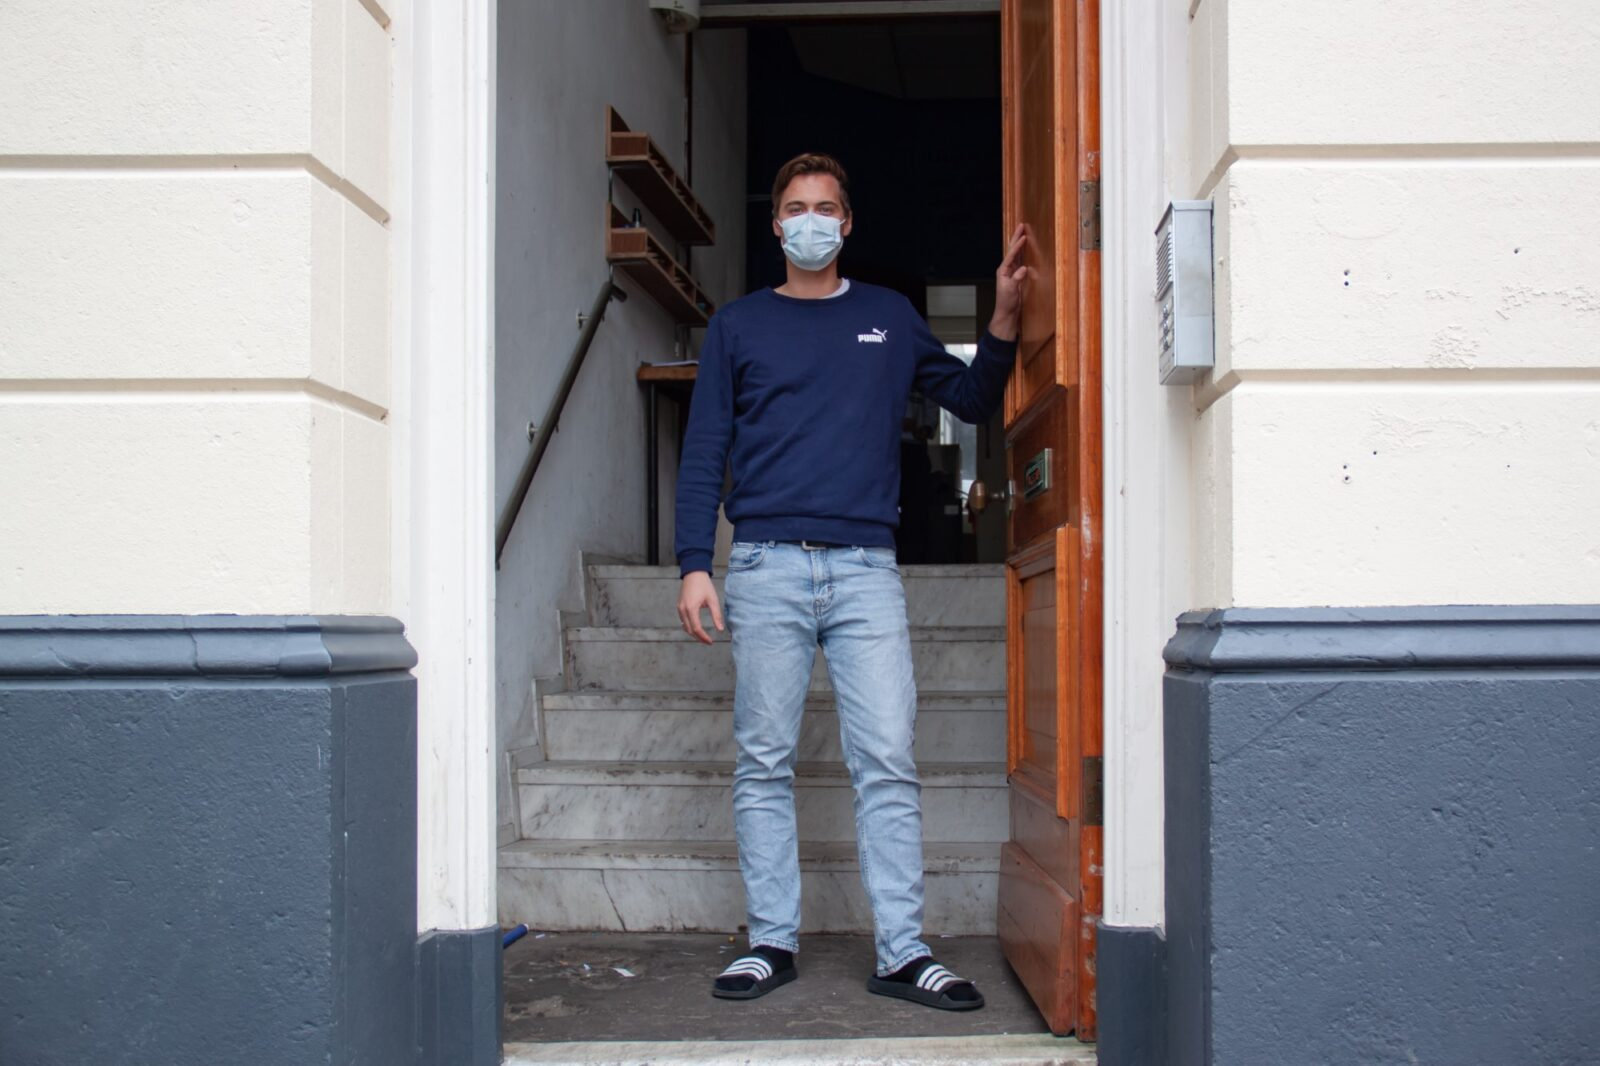 huize bommel quarantaine studentenhuis NSR foto Milena Chopova (3) (EM)